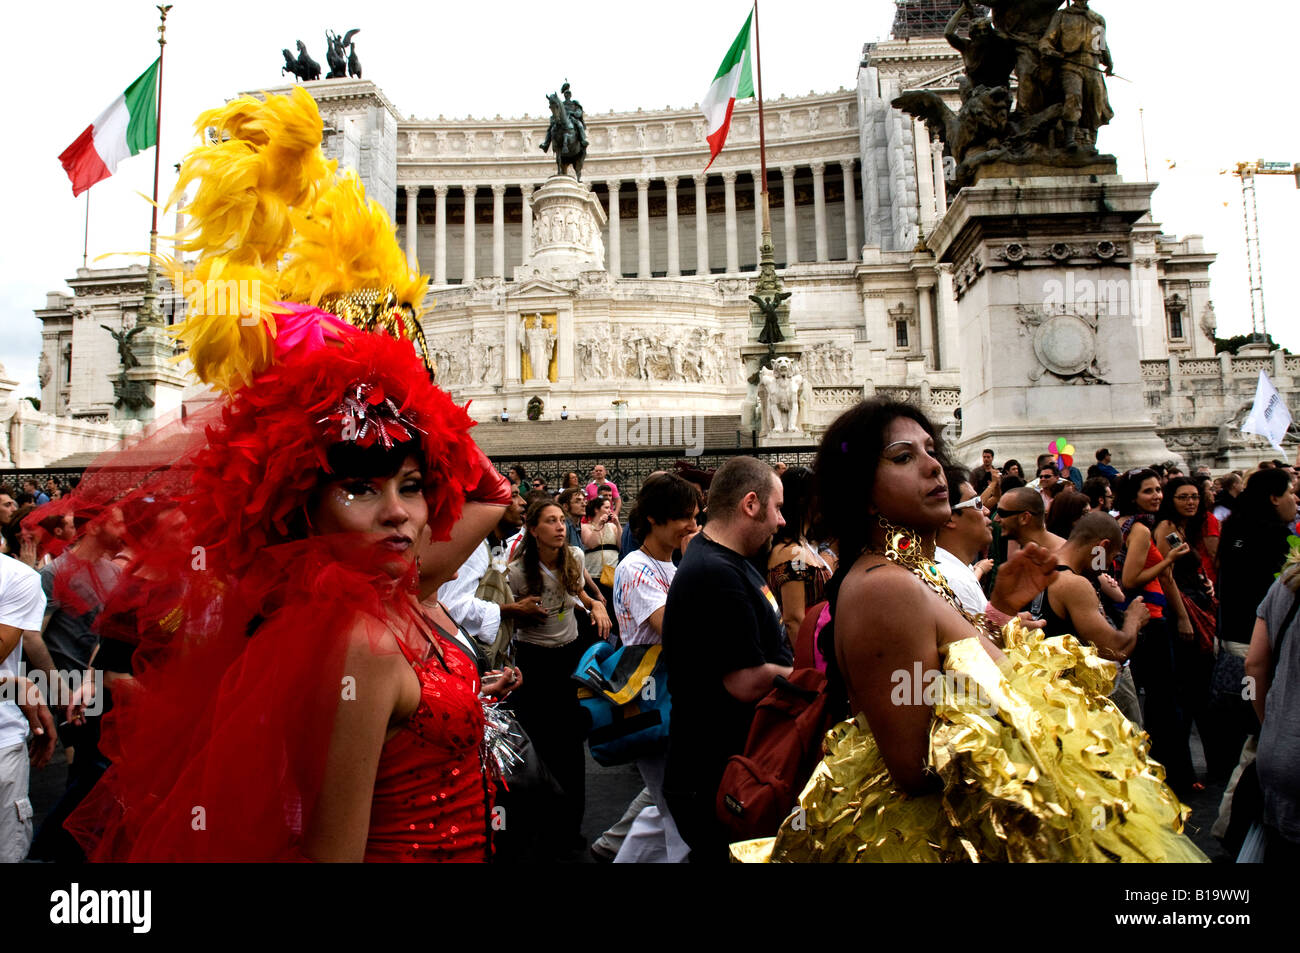 Drag Queens sur la Piazza Venezia de Rome au cours de la Gay Pride de Photo Stock